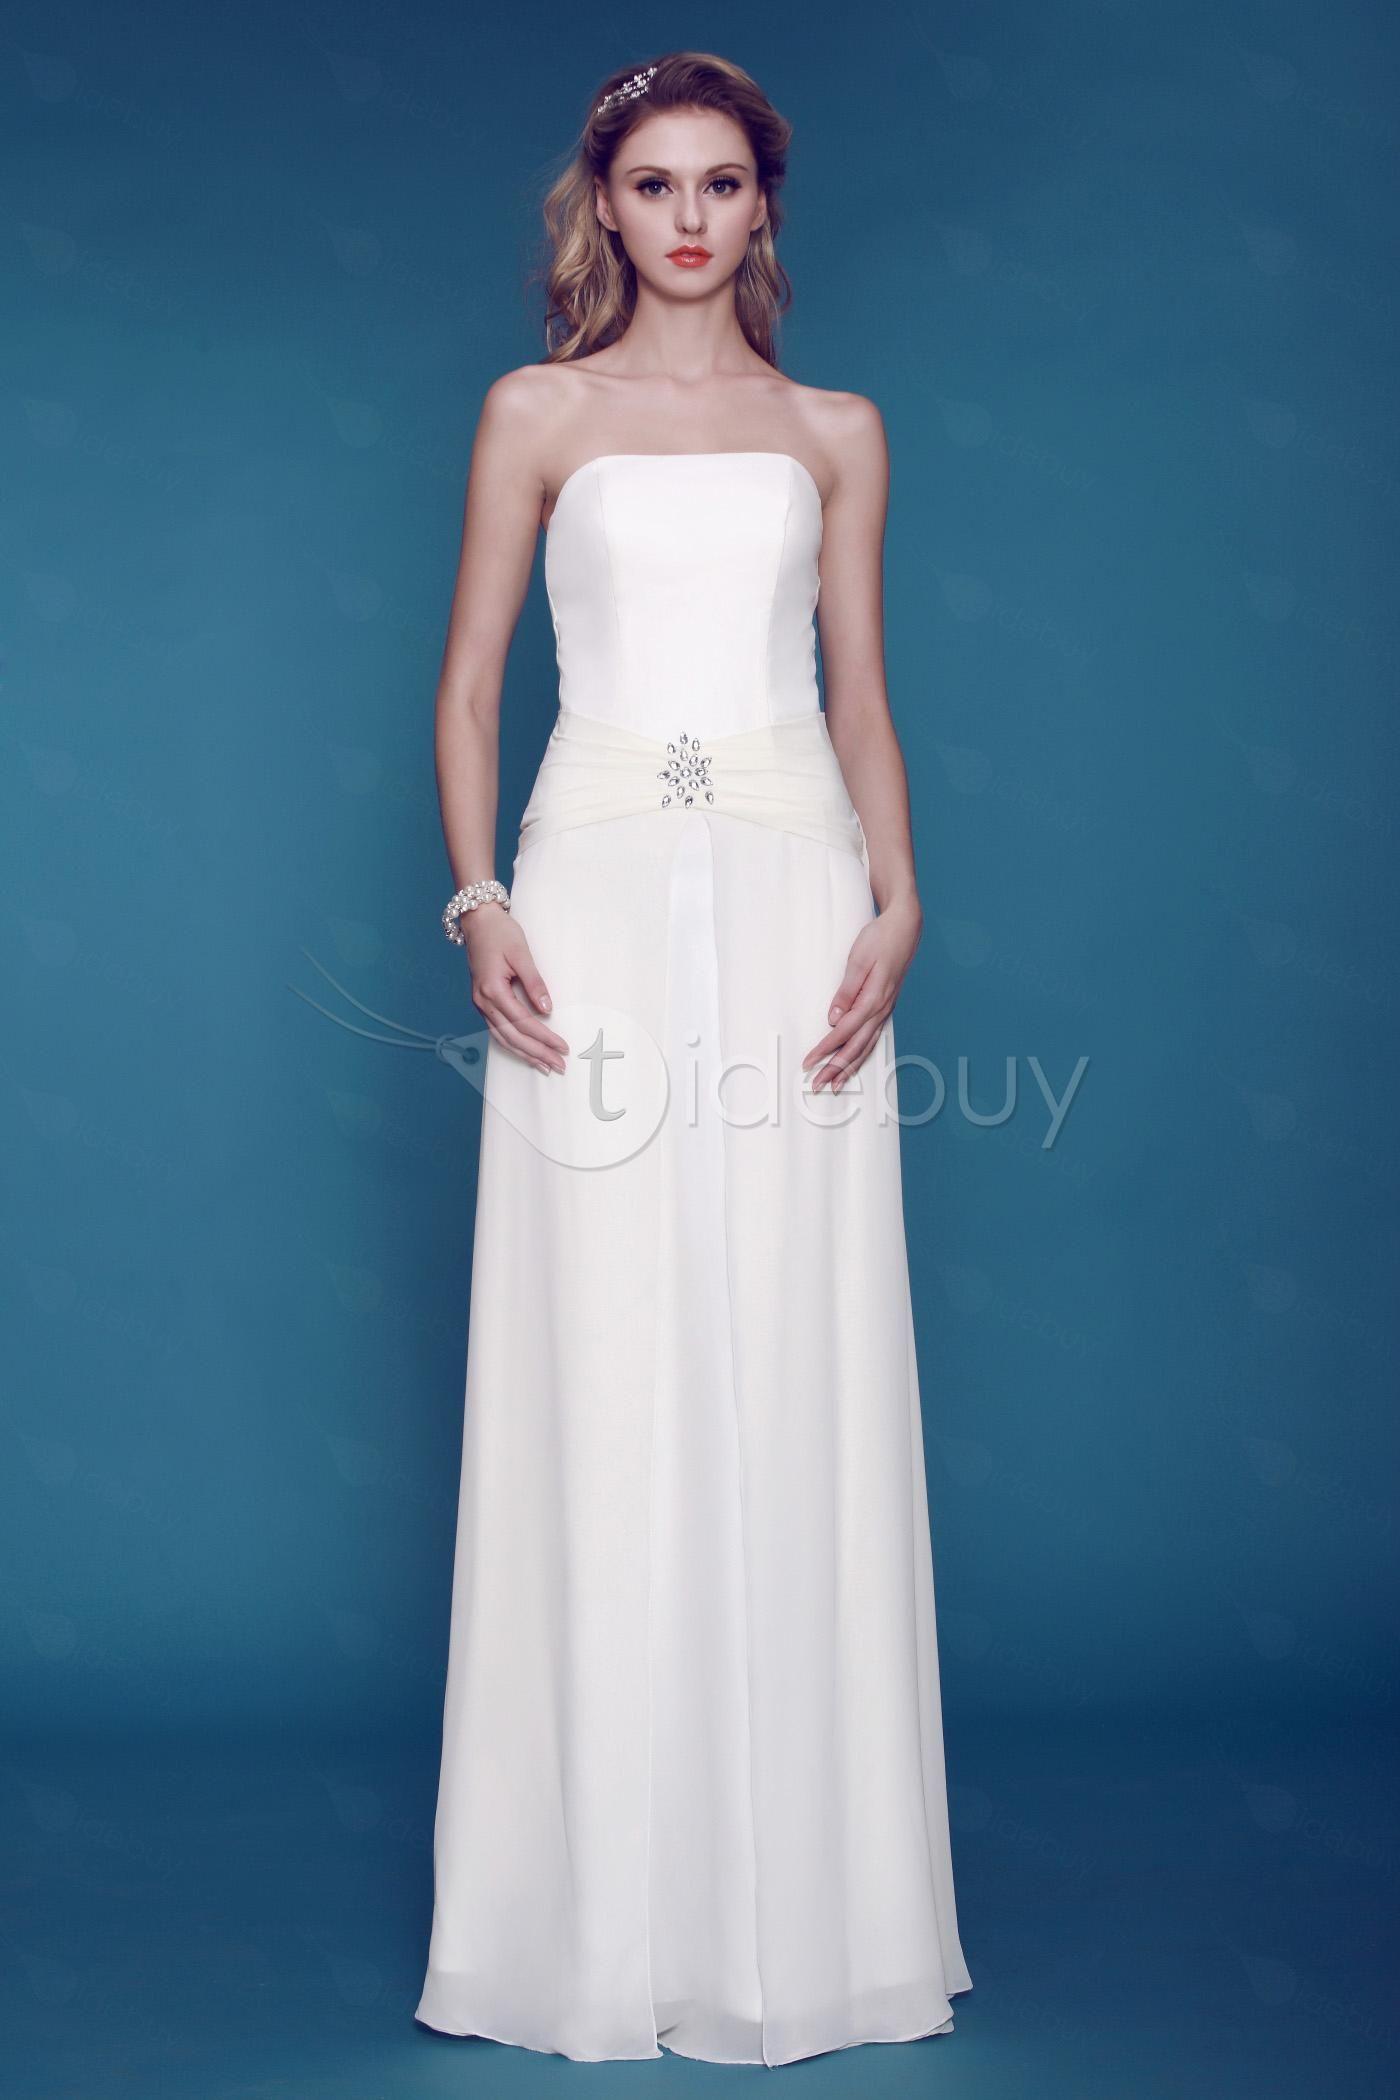 Bridesmaid dress wedding pinterest